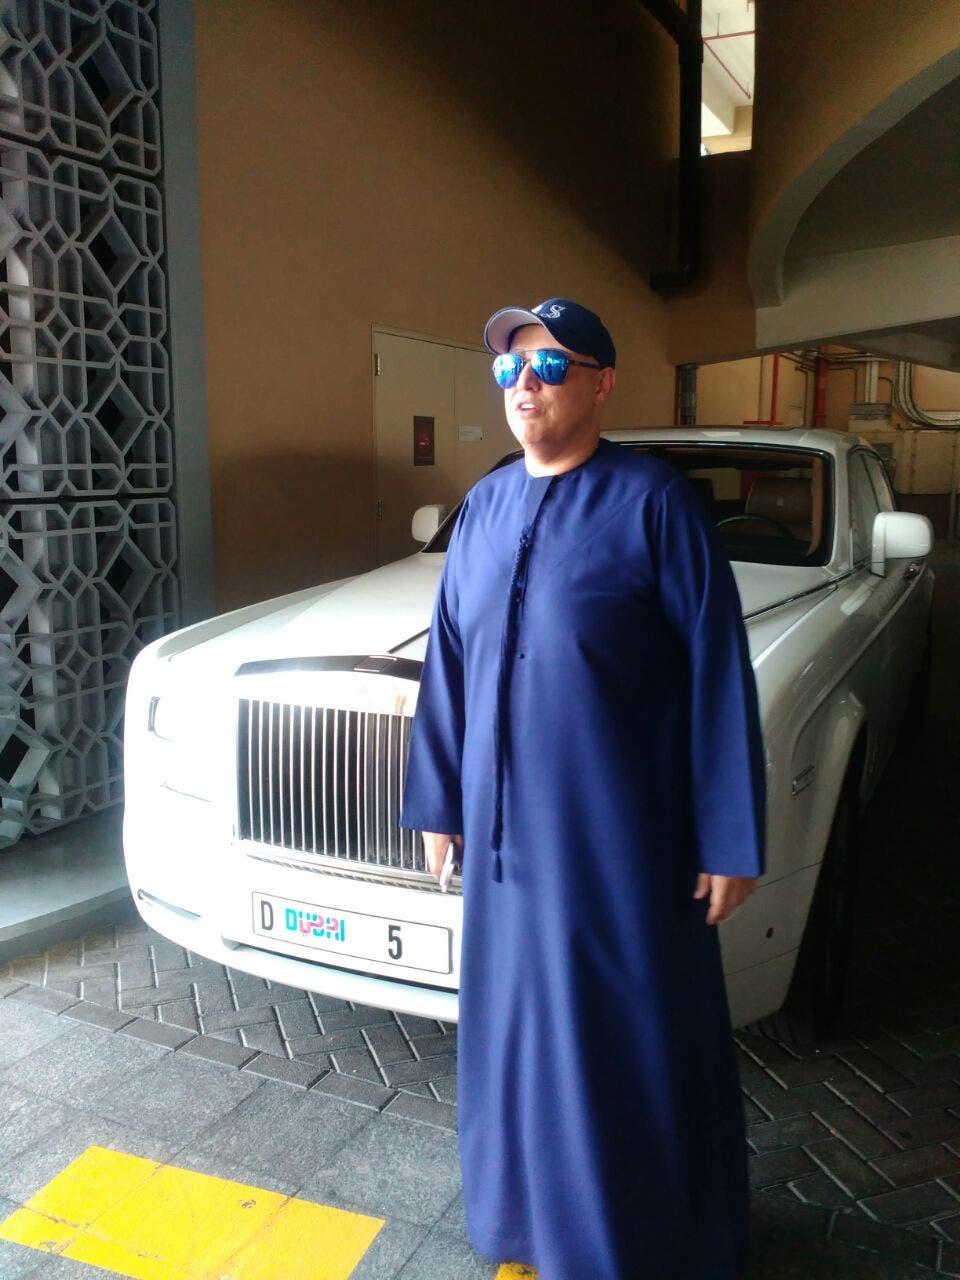 Raj Sahni with his white RollsDubai-based Indian businessman Raj Sahni of RSG International with his white Rolls Royce bearing the D5 unique license plate. (Supplied photo)